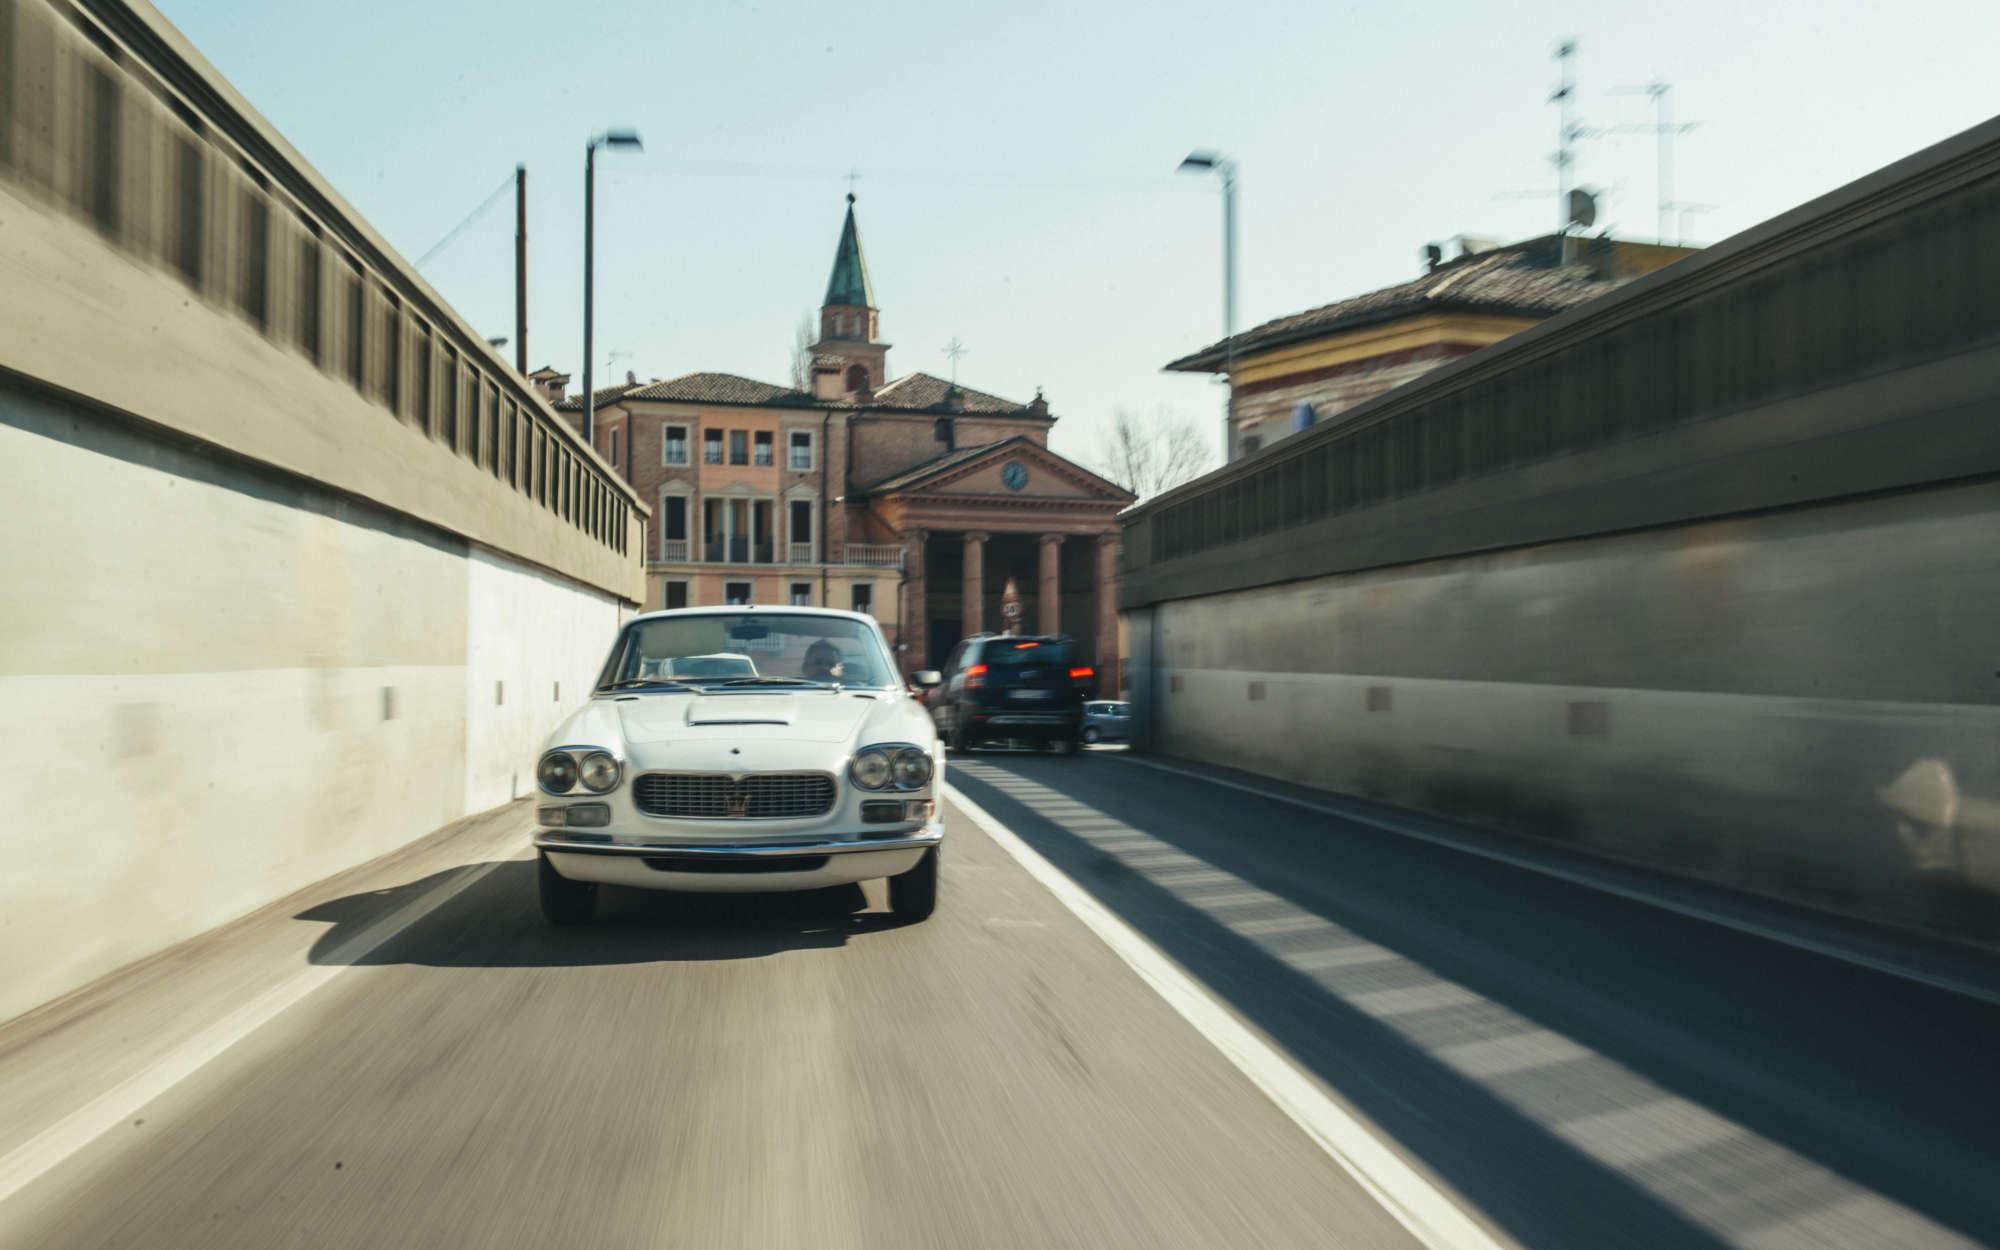 Tralli Maserati Sebring footer content images 6000 3750